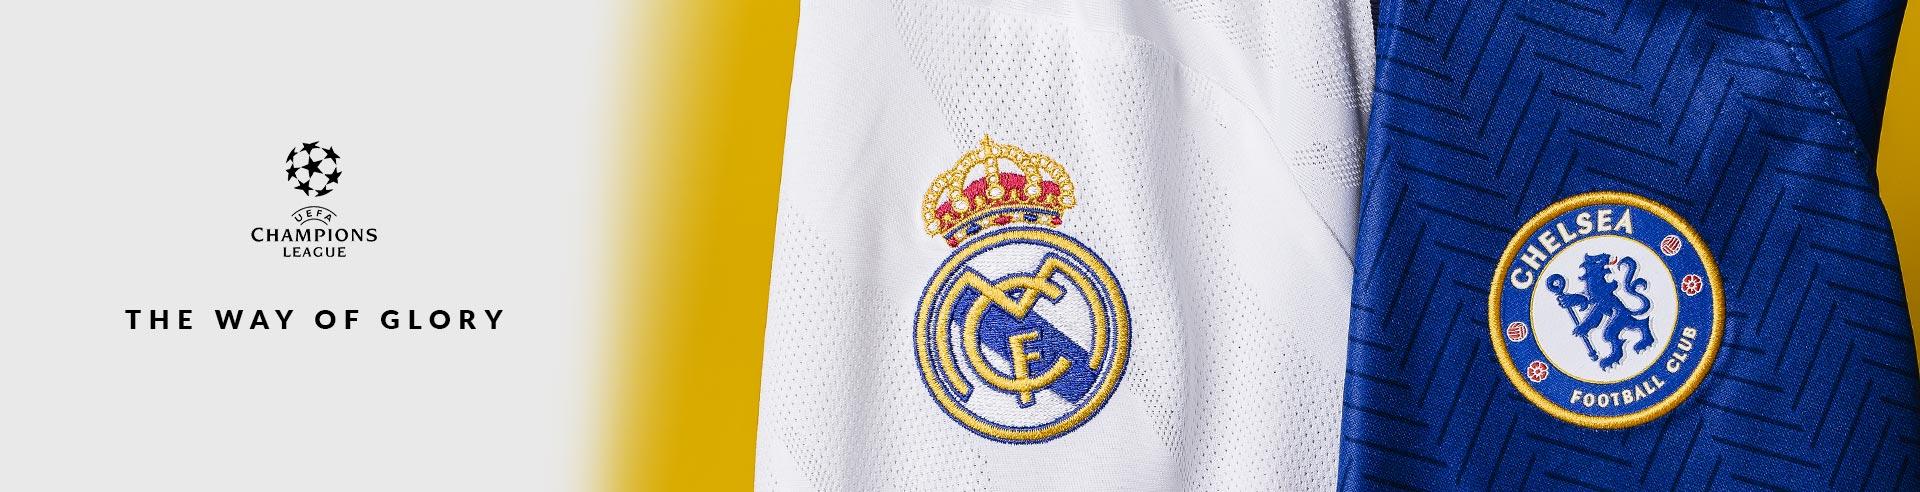 CHAMPIONS SEMIFINAL REAL MADRID CHELSEA